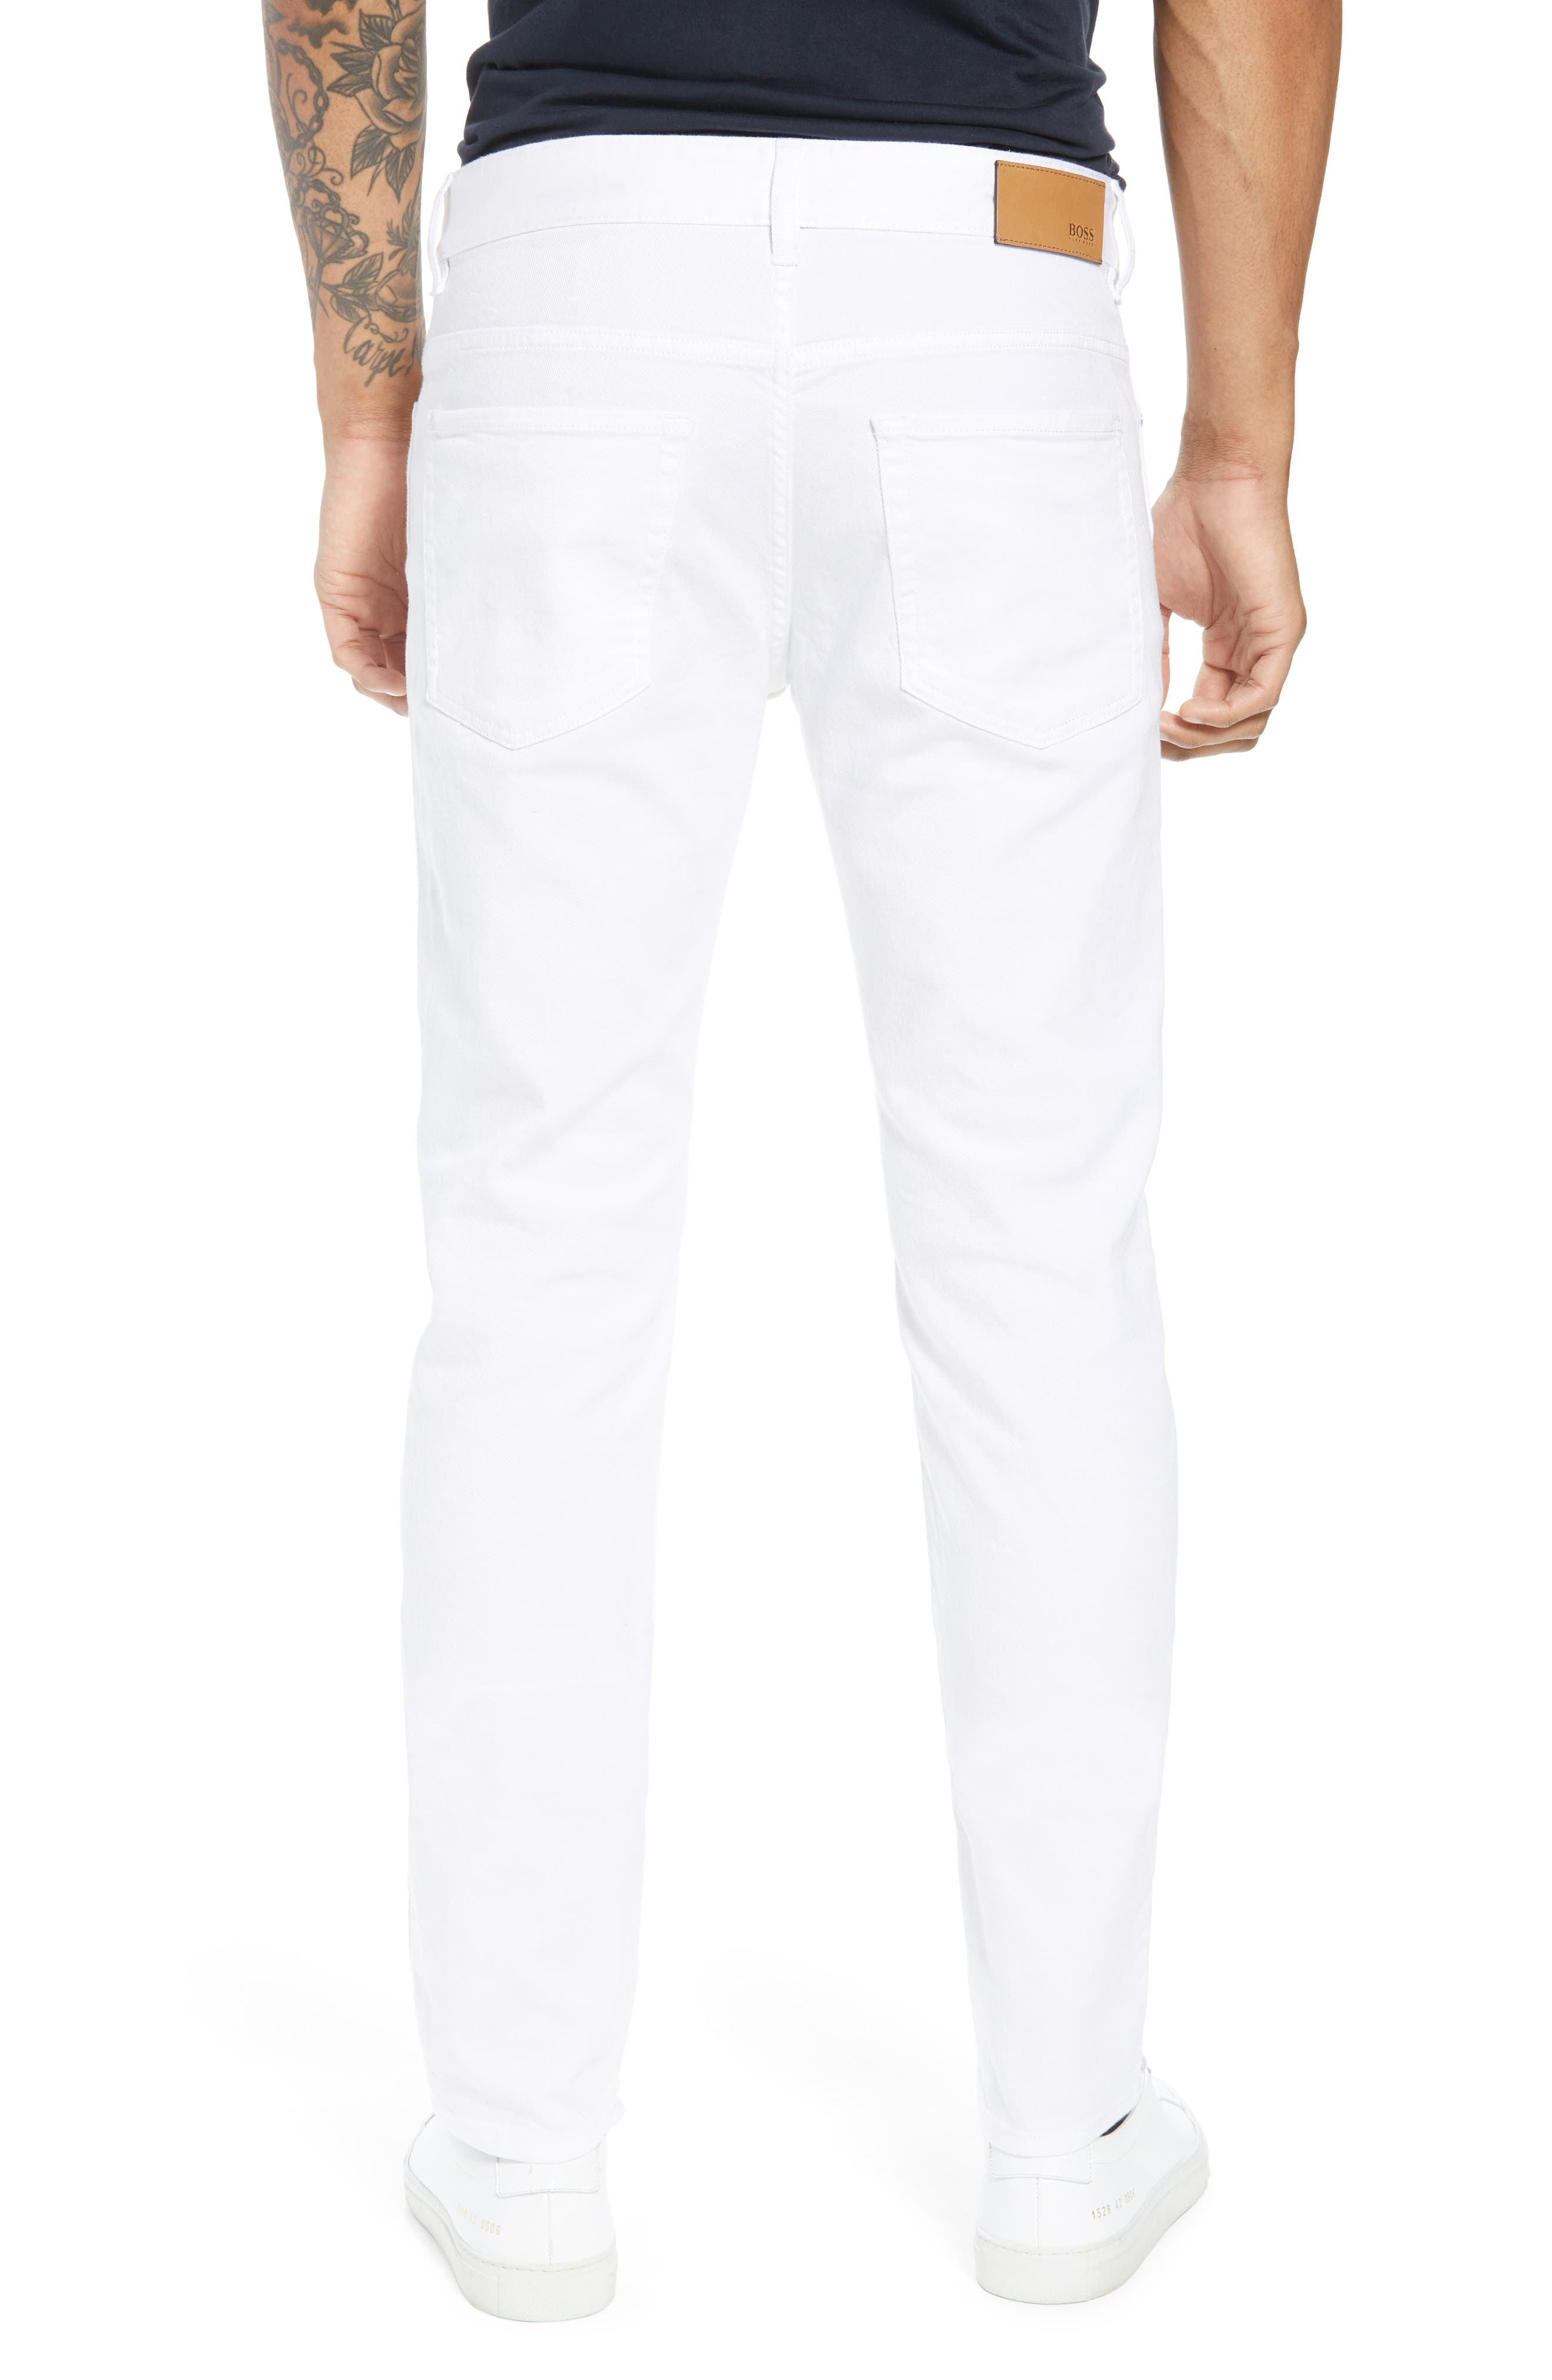 Delaware Slim Fit Jeans,                             Alternate thumbnail 2, color,                             White